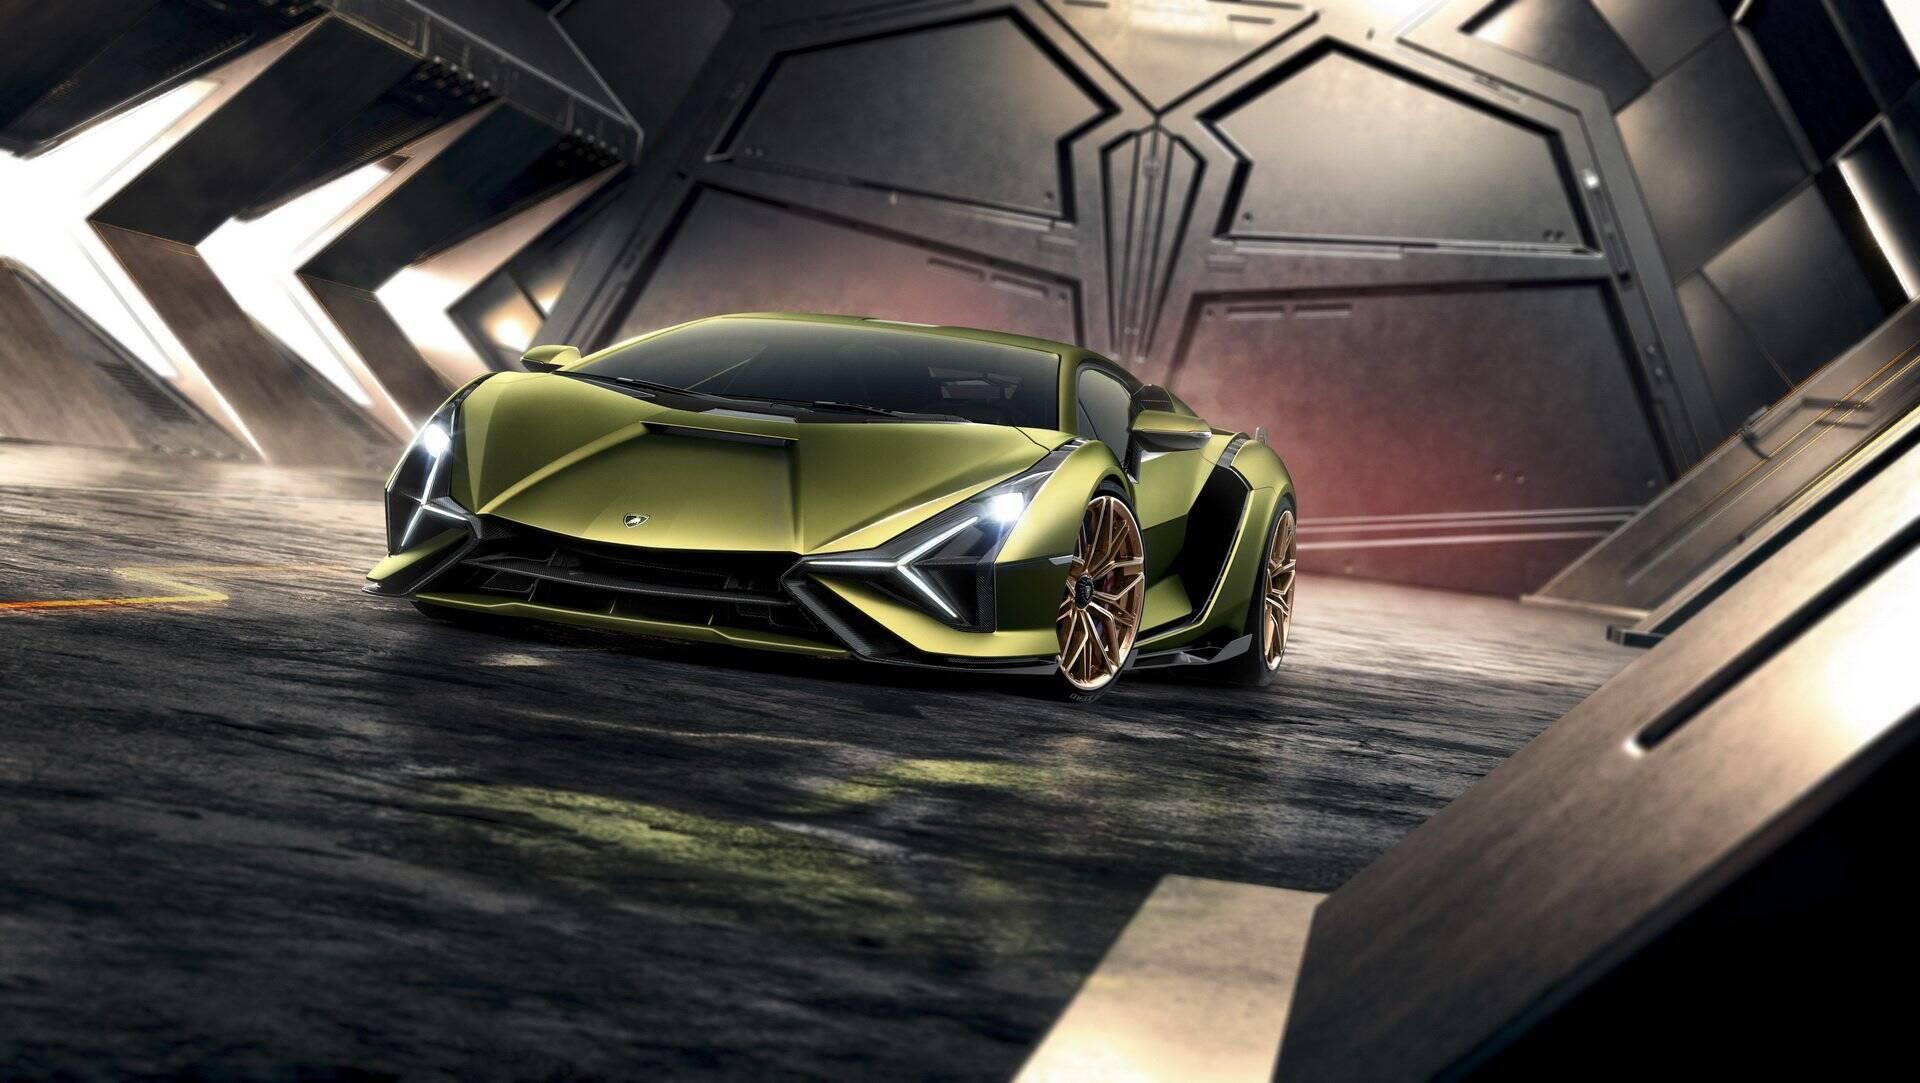 Lamborghini Sián. Foto: Divulgação